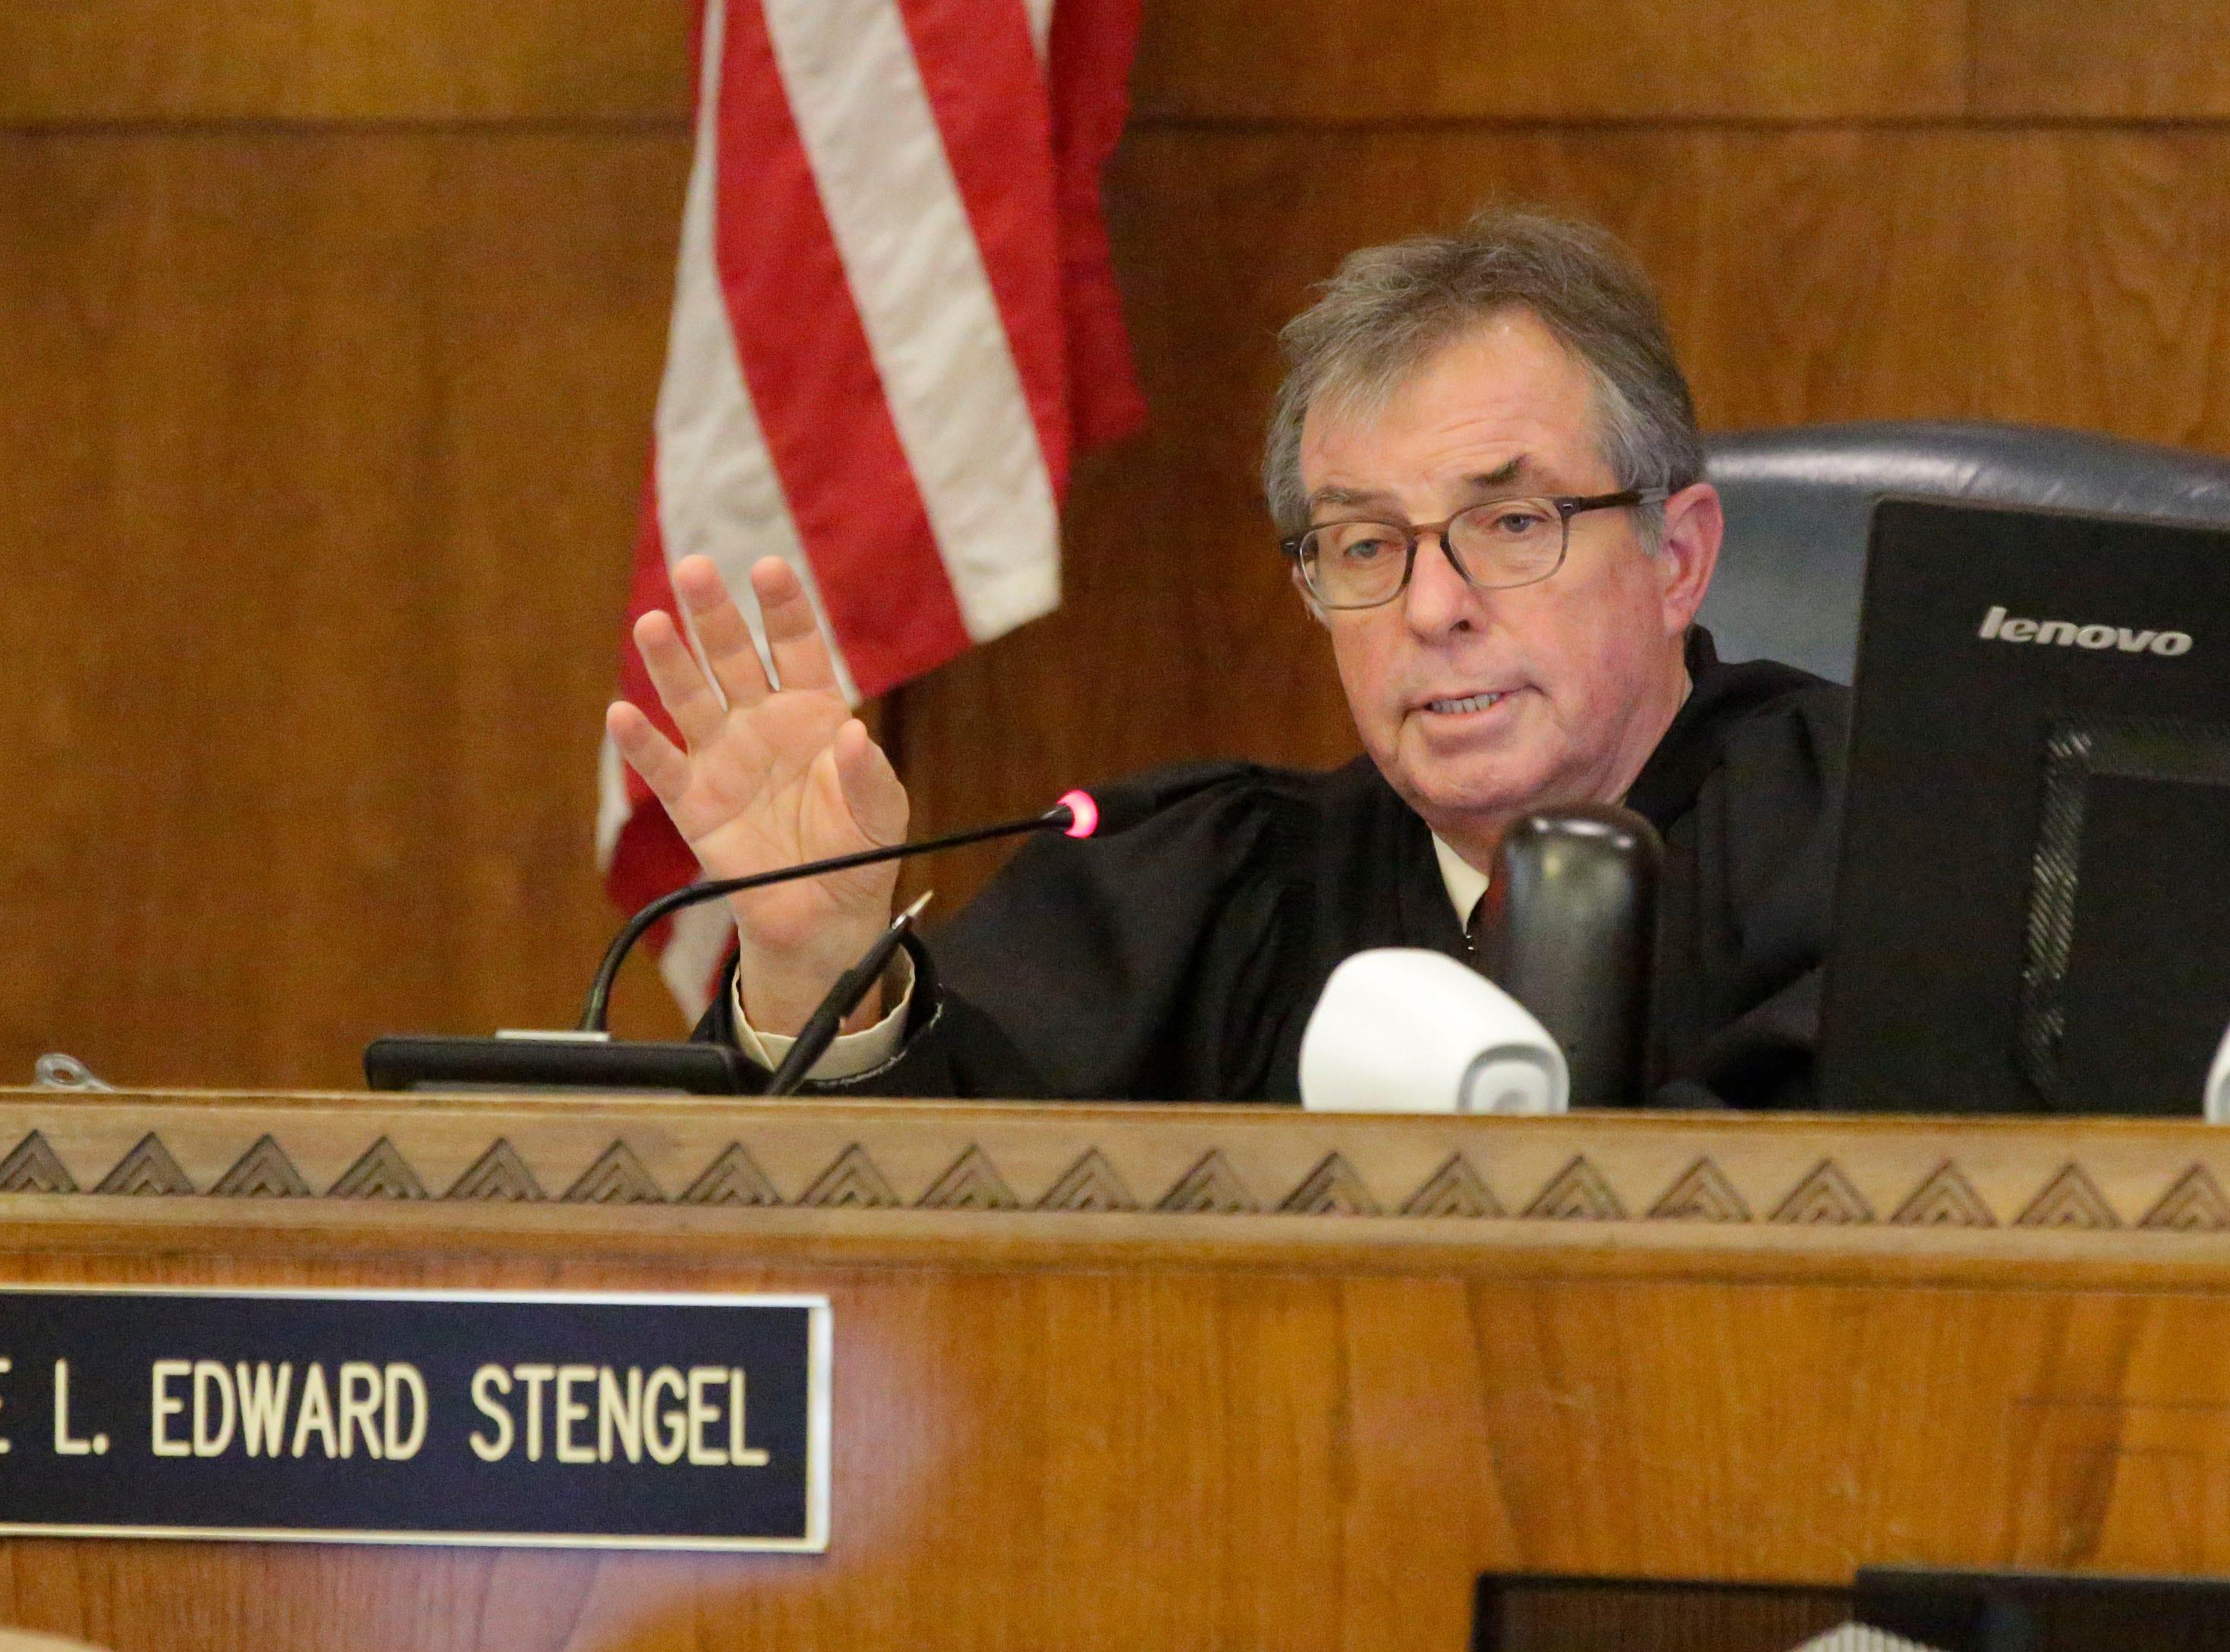 Judge L. Edward Stengel talks during the sentencing hearing for Christy Rose Tuchel, Friday, October 5, 2018, in Sheboygan, Wis.